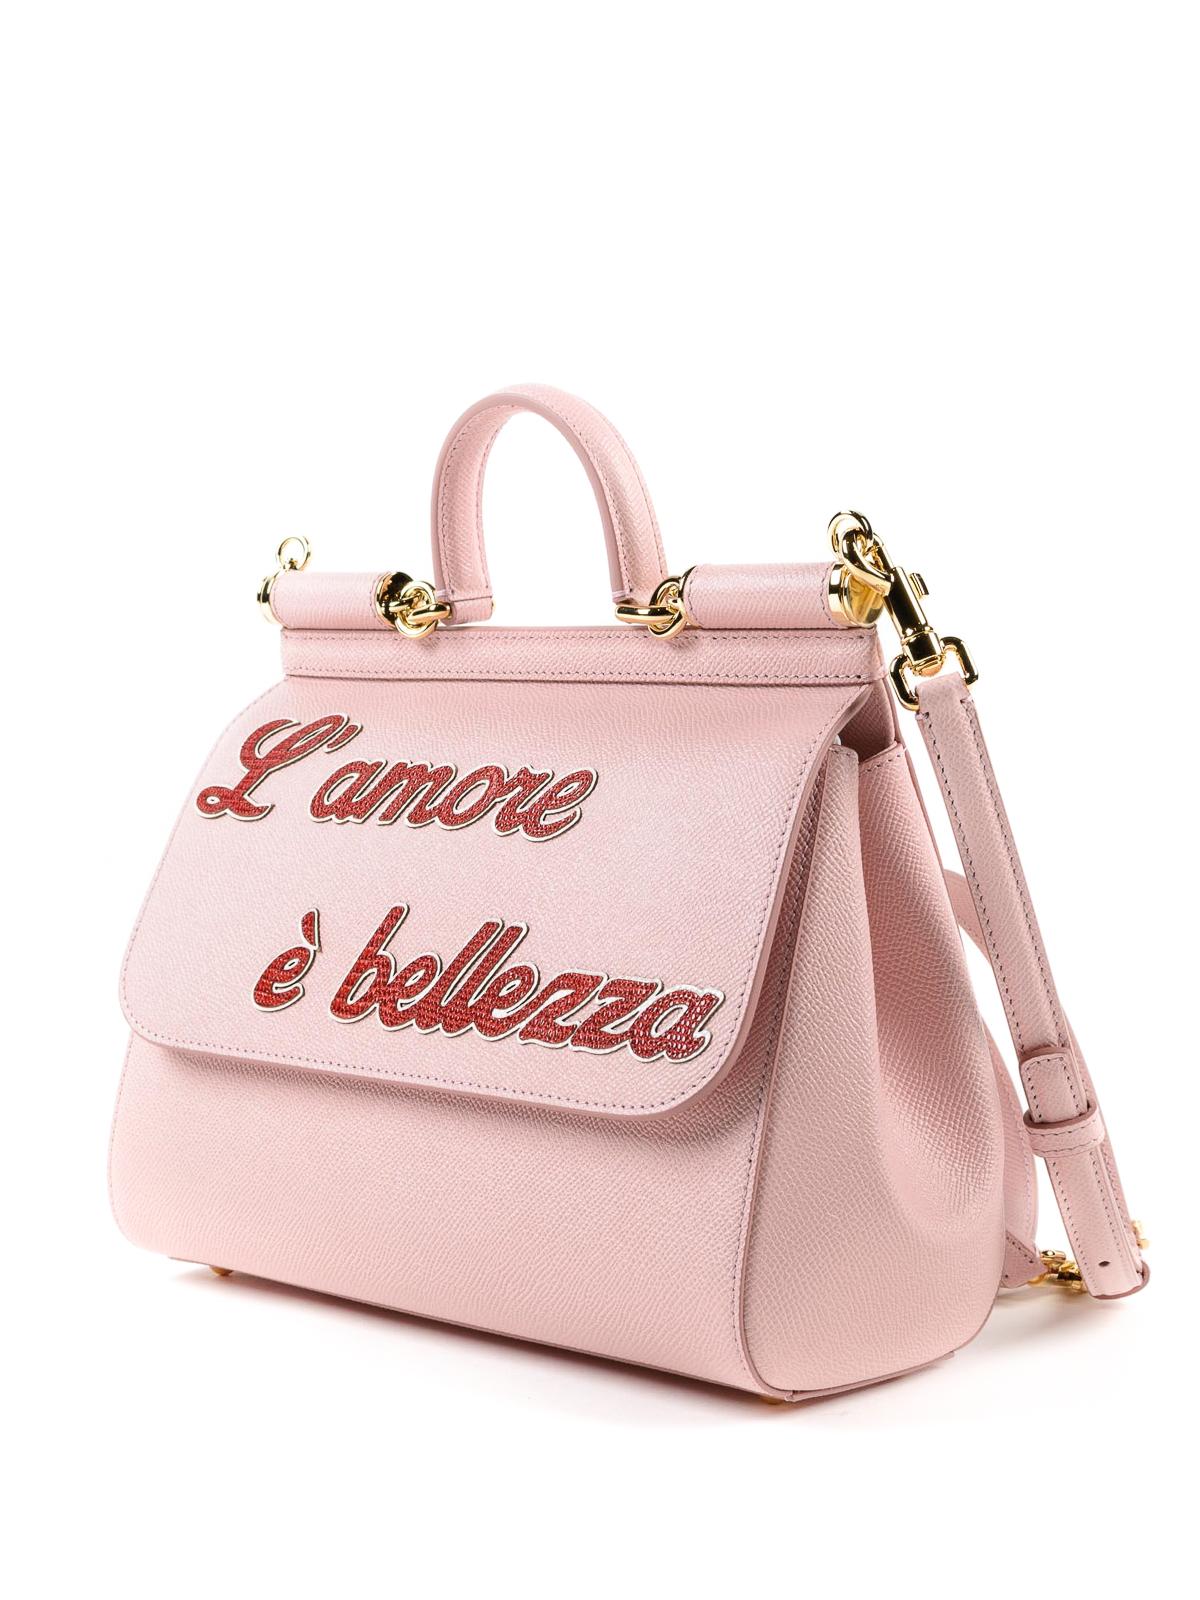 Dolce & Gabbana Lamore e bellezza pink Sicily M rmx1fI3dyn